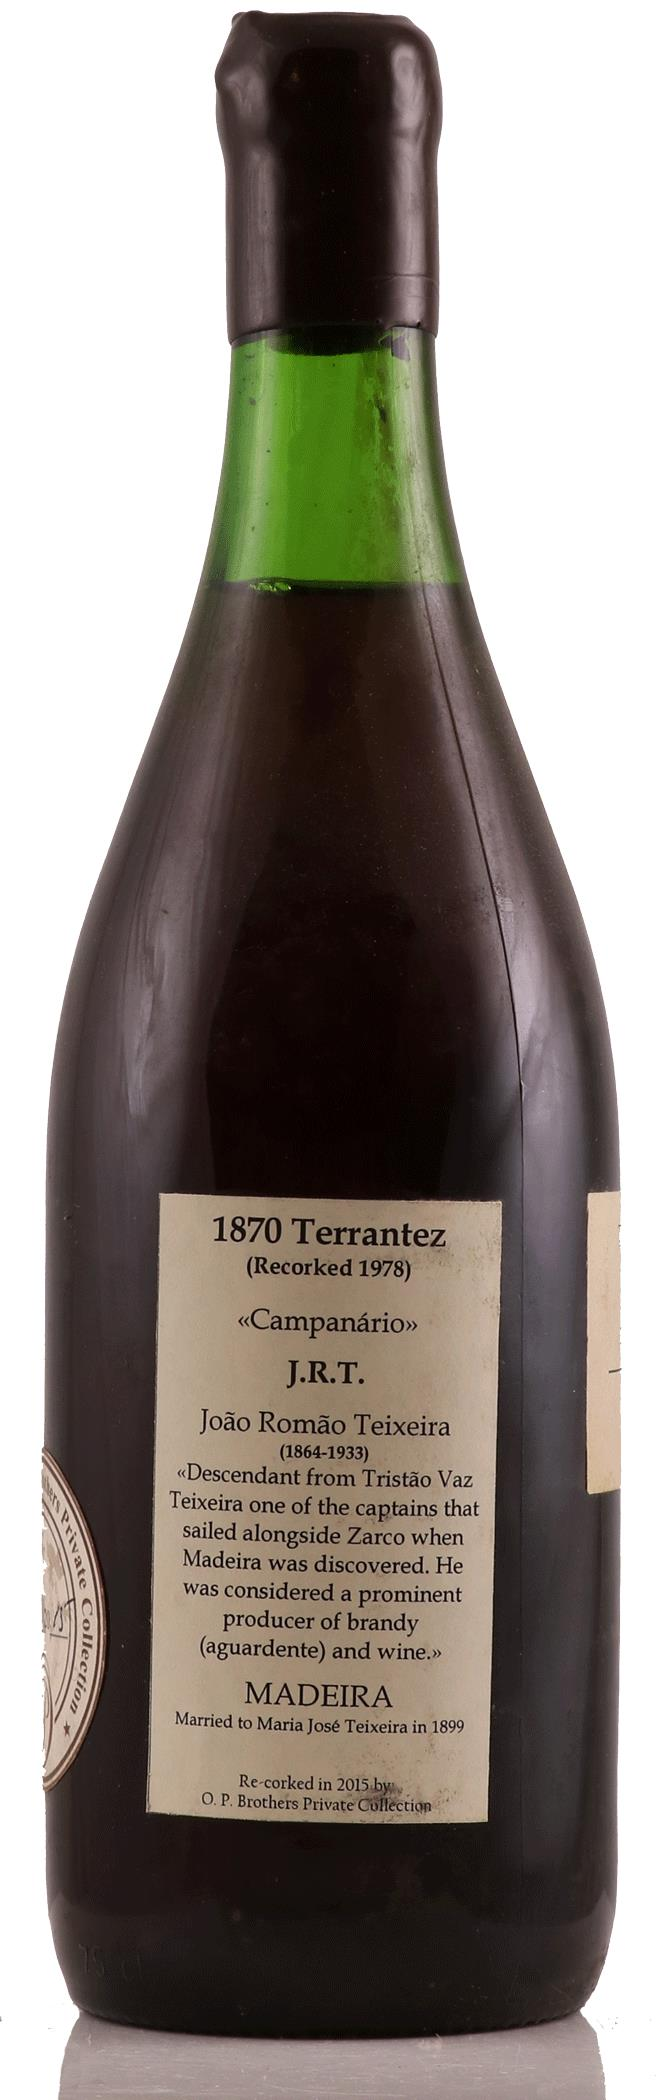 Madeira 1870 Teixeira, Joao Romao